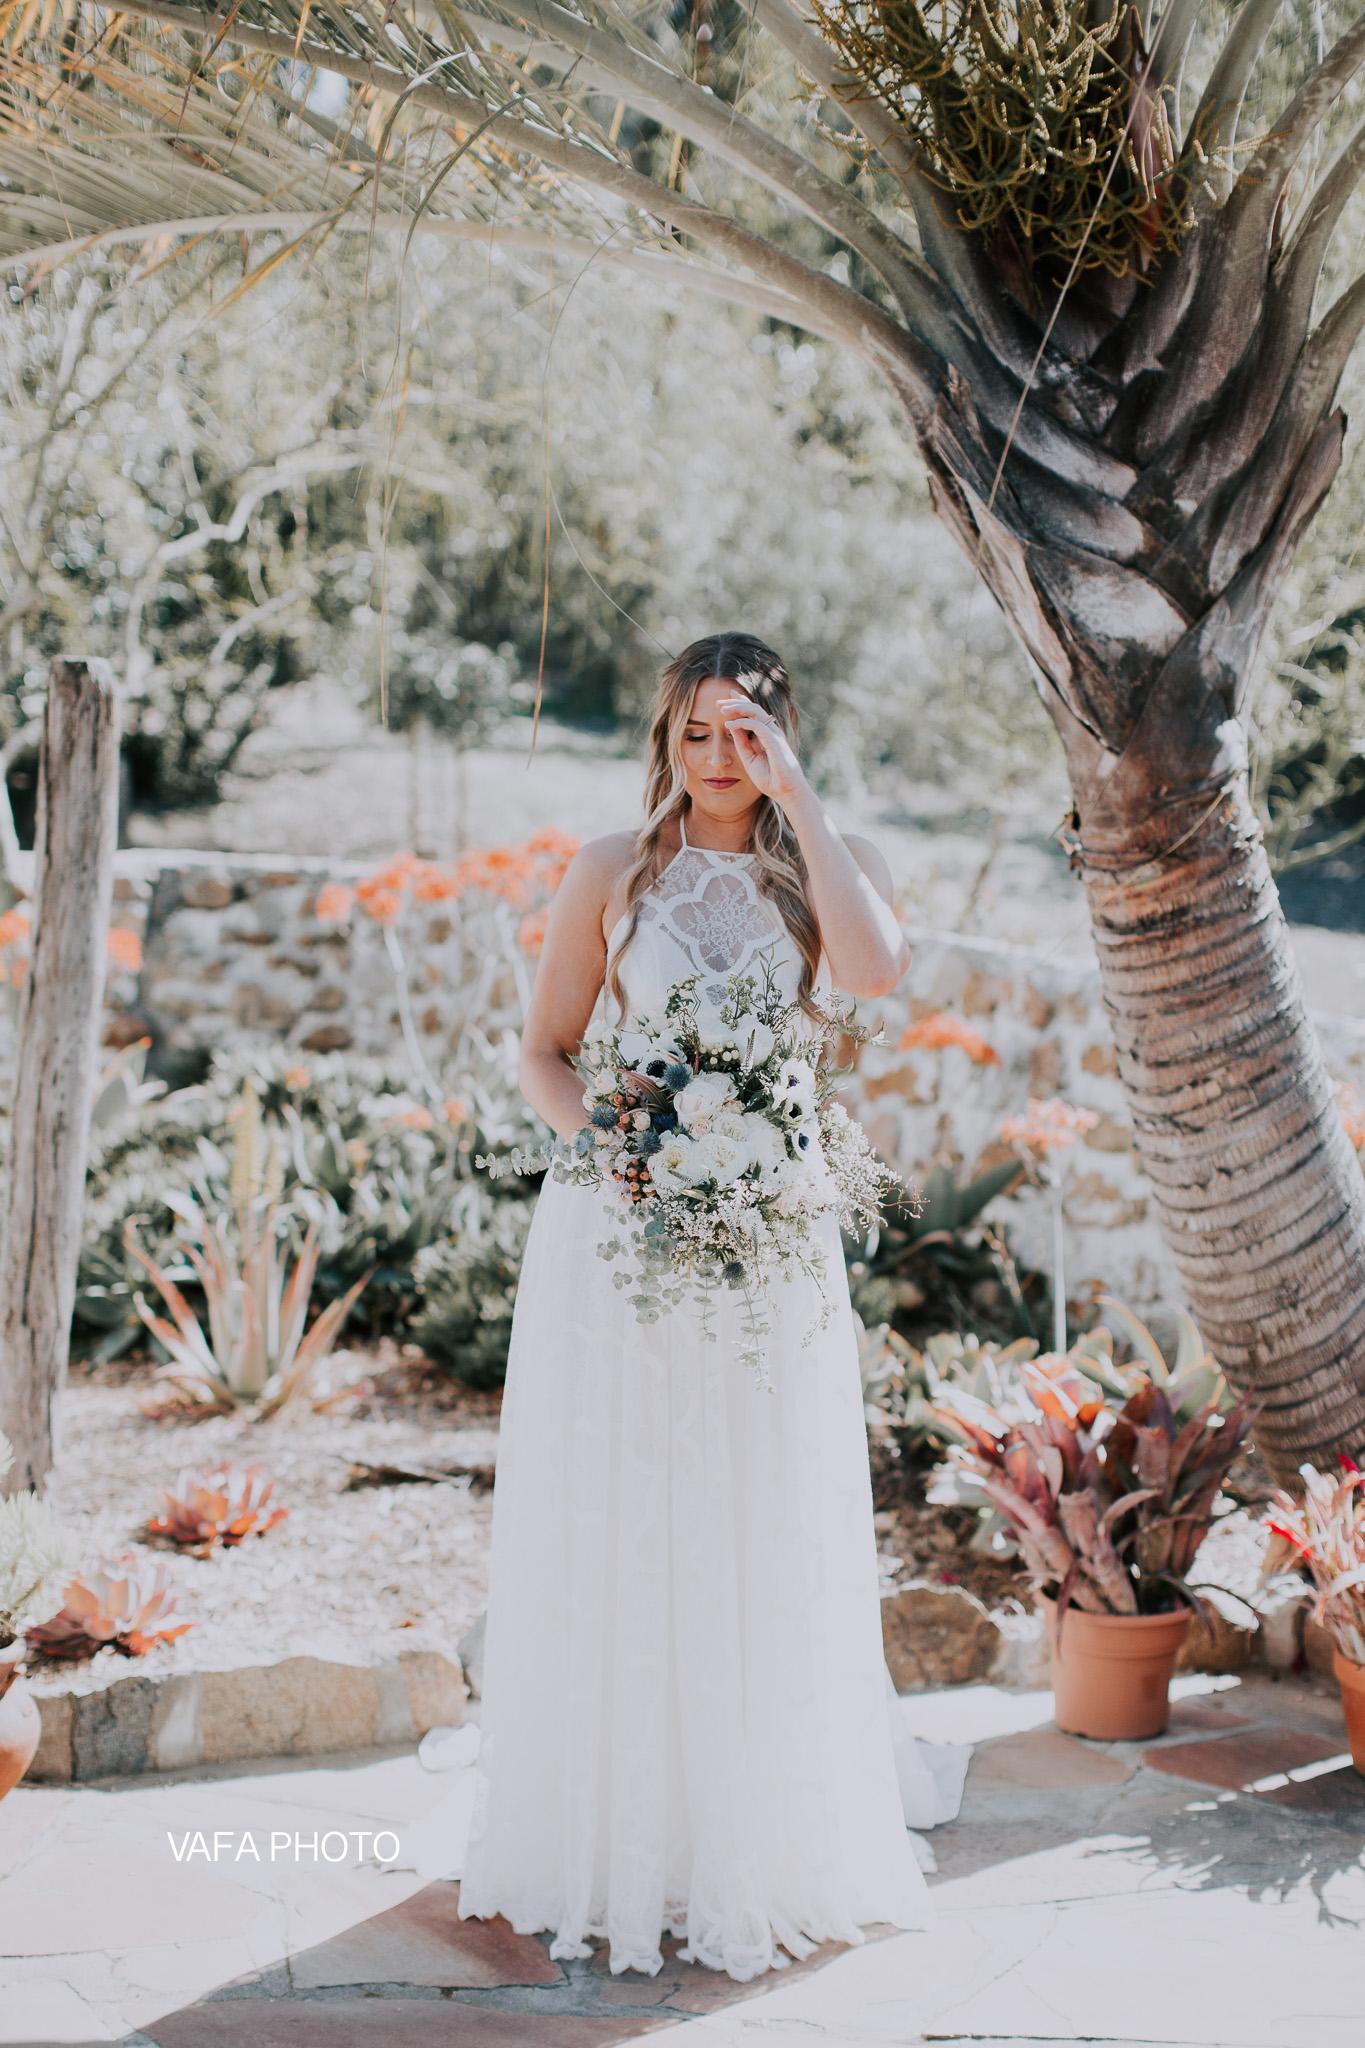 Leo-Carrillo-Ranch-Wedding-Lauren-Mike-Vafa-Photo-326.jpg